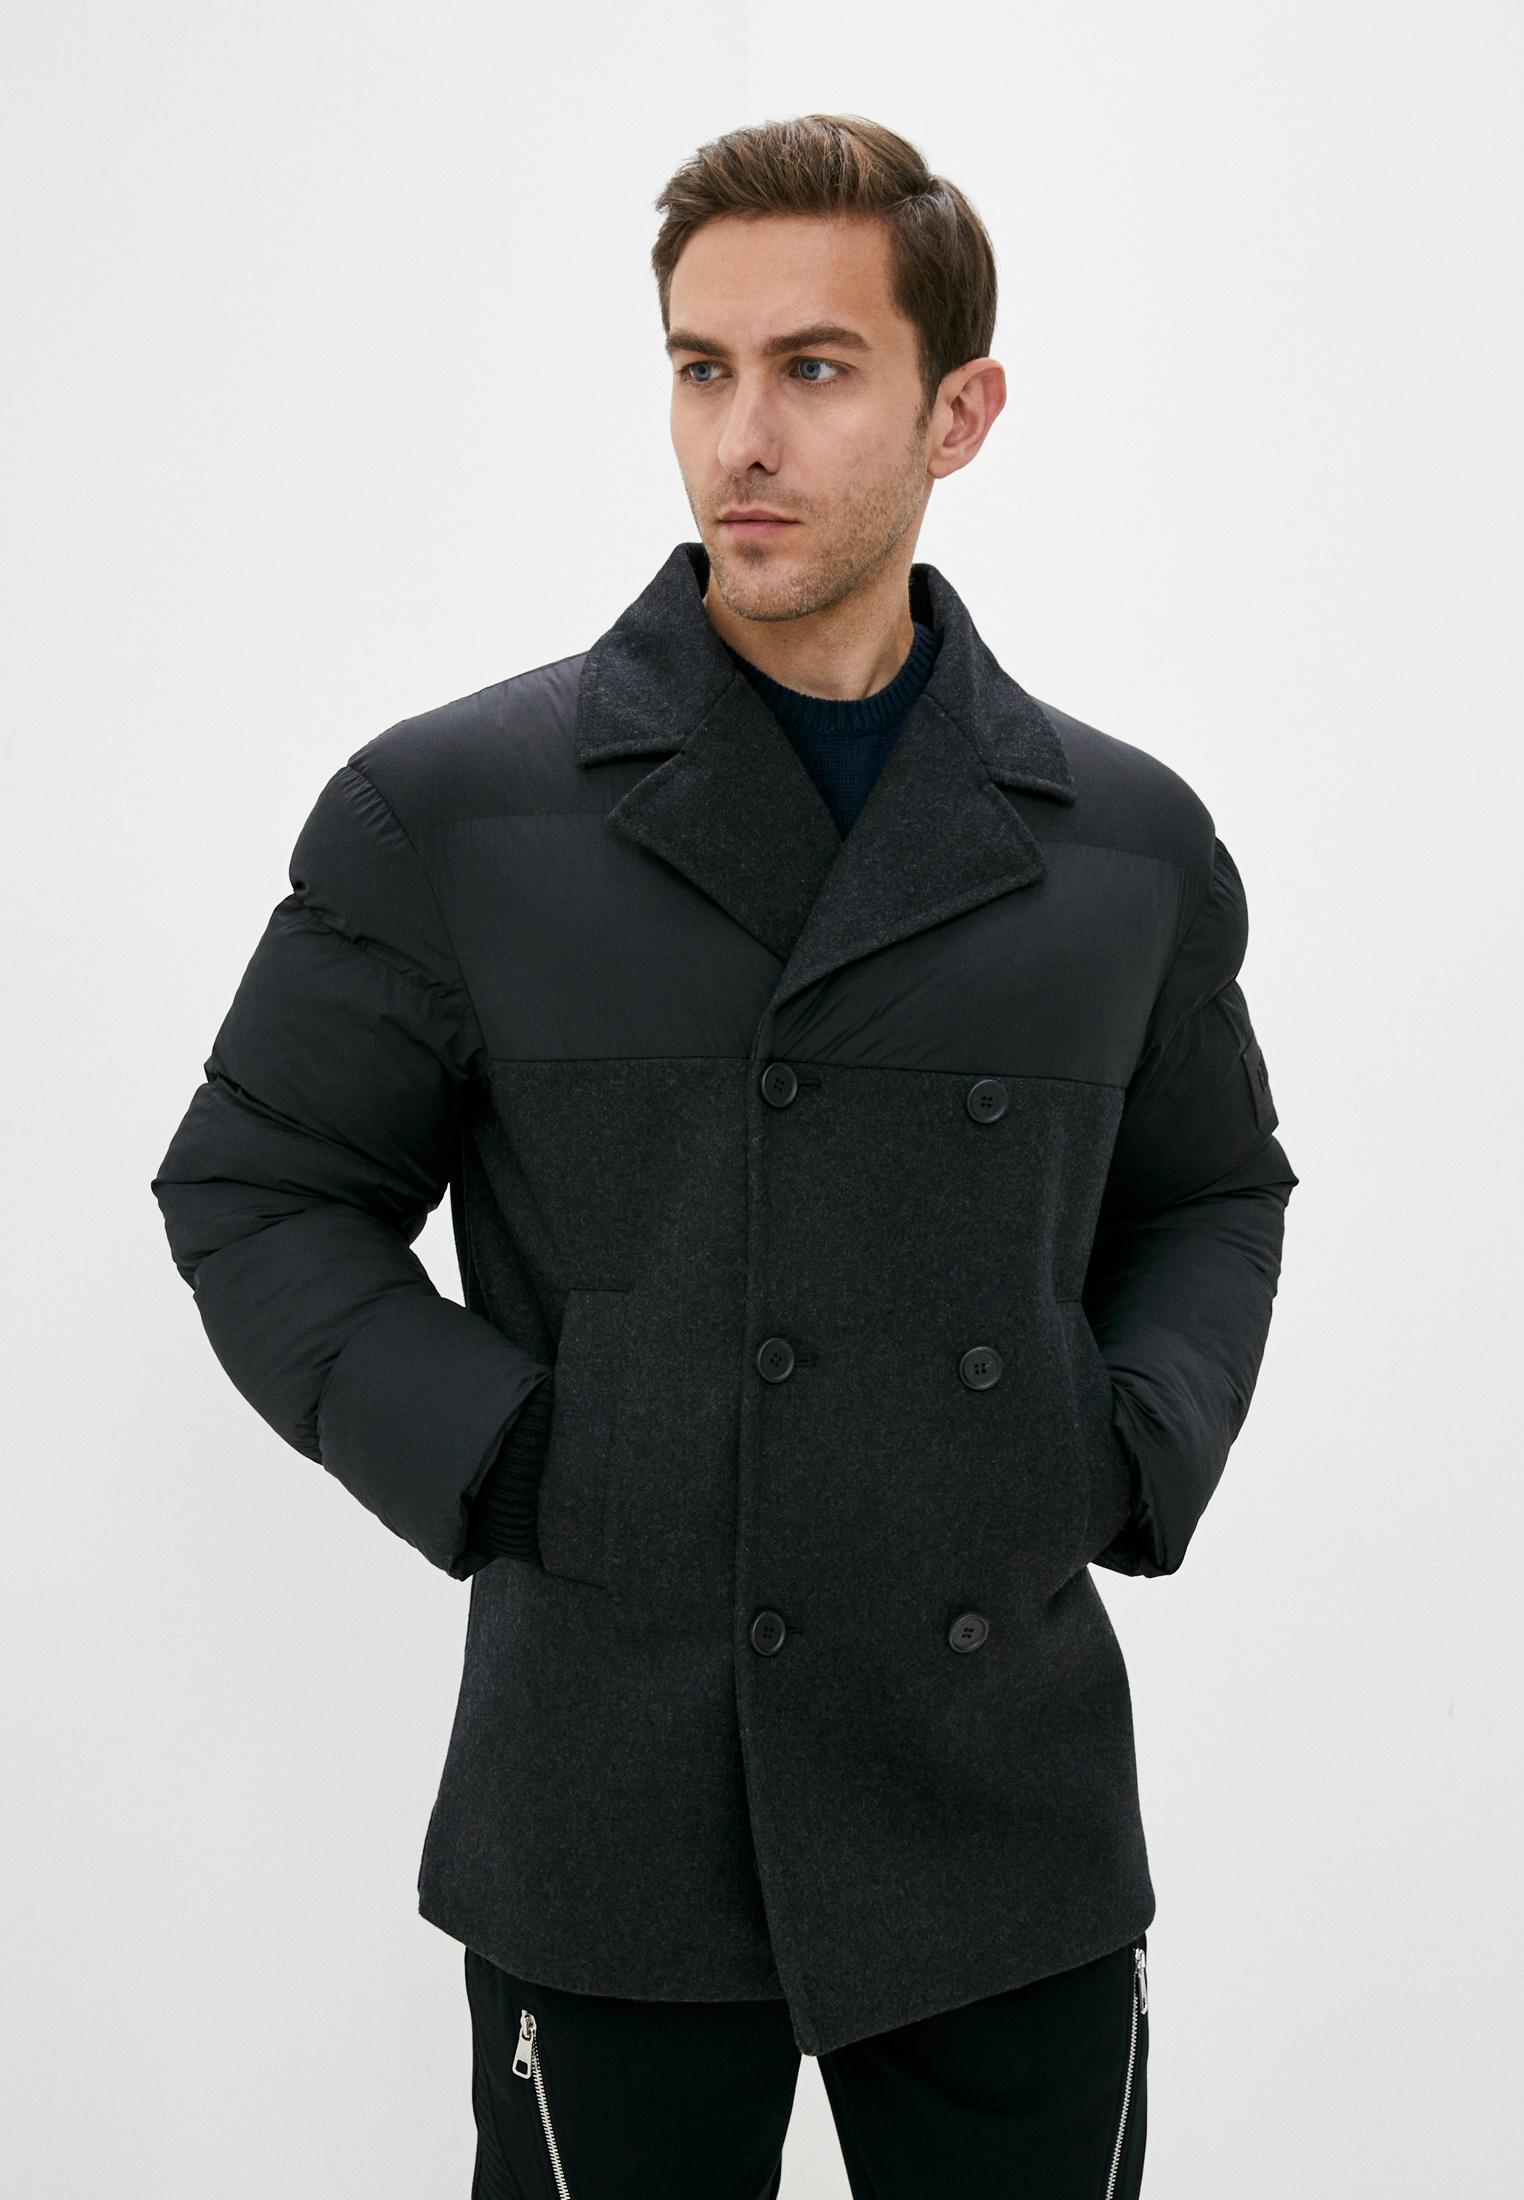 Мужская куртка Bikkembergs (Биккембергс) C J 038 80 S 3464